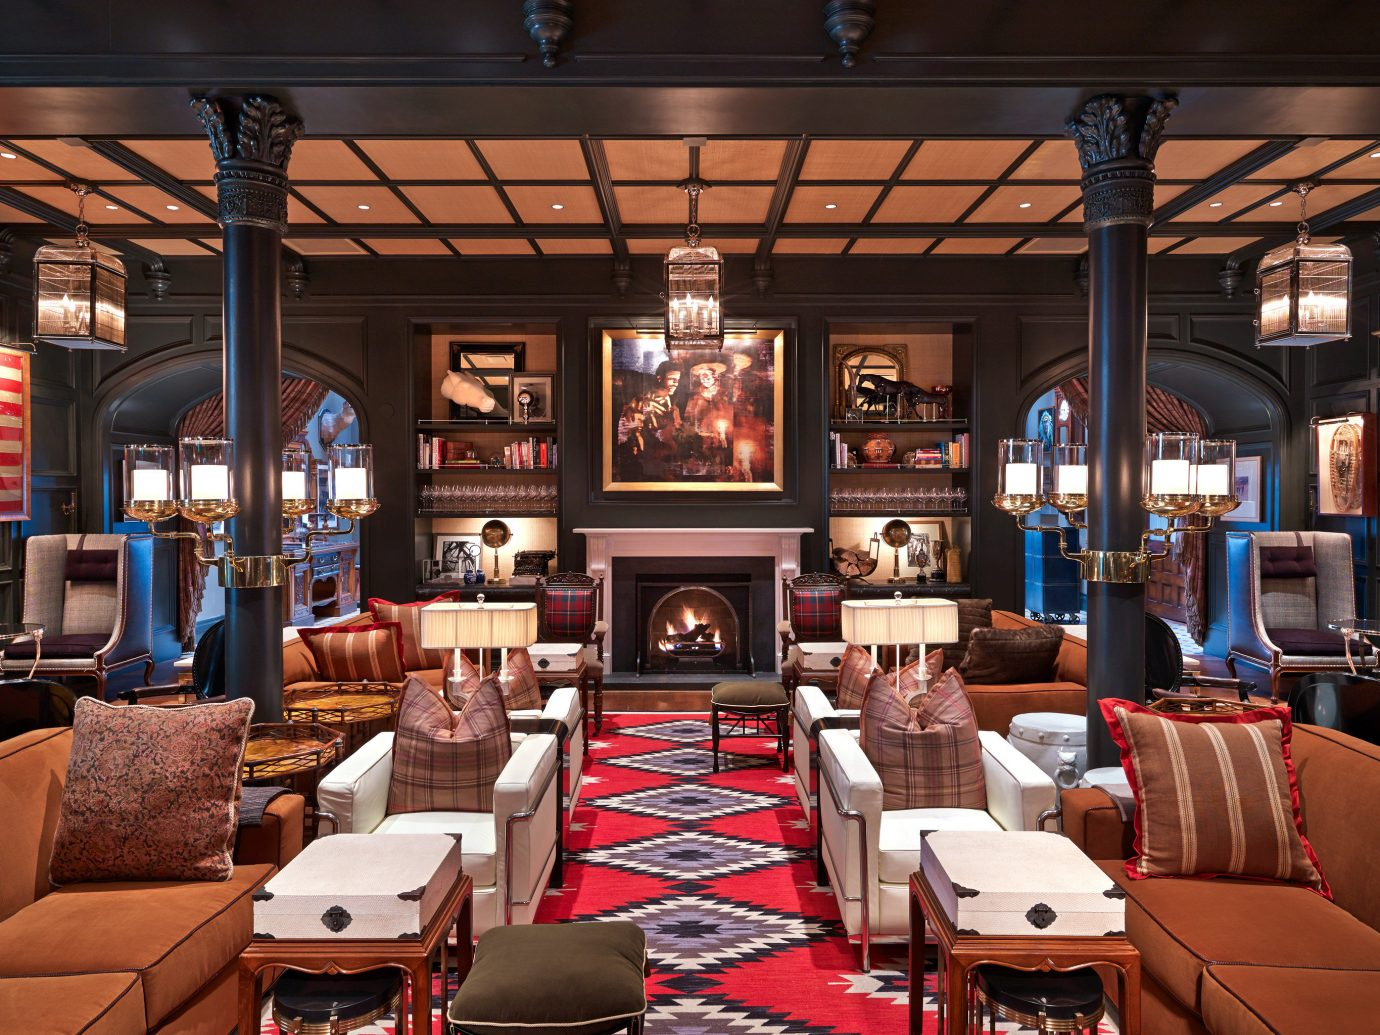 Fireplace Hotels Lobby Lounge Trip Ideas Winter indoor room Living restaurant interior design café Bar furniture several